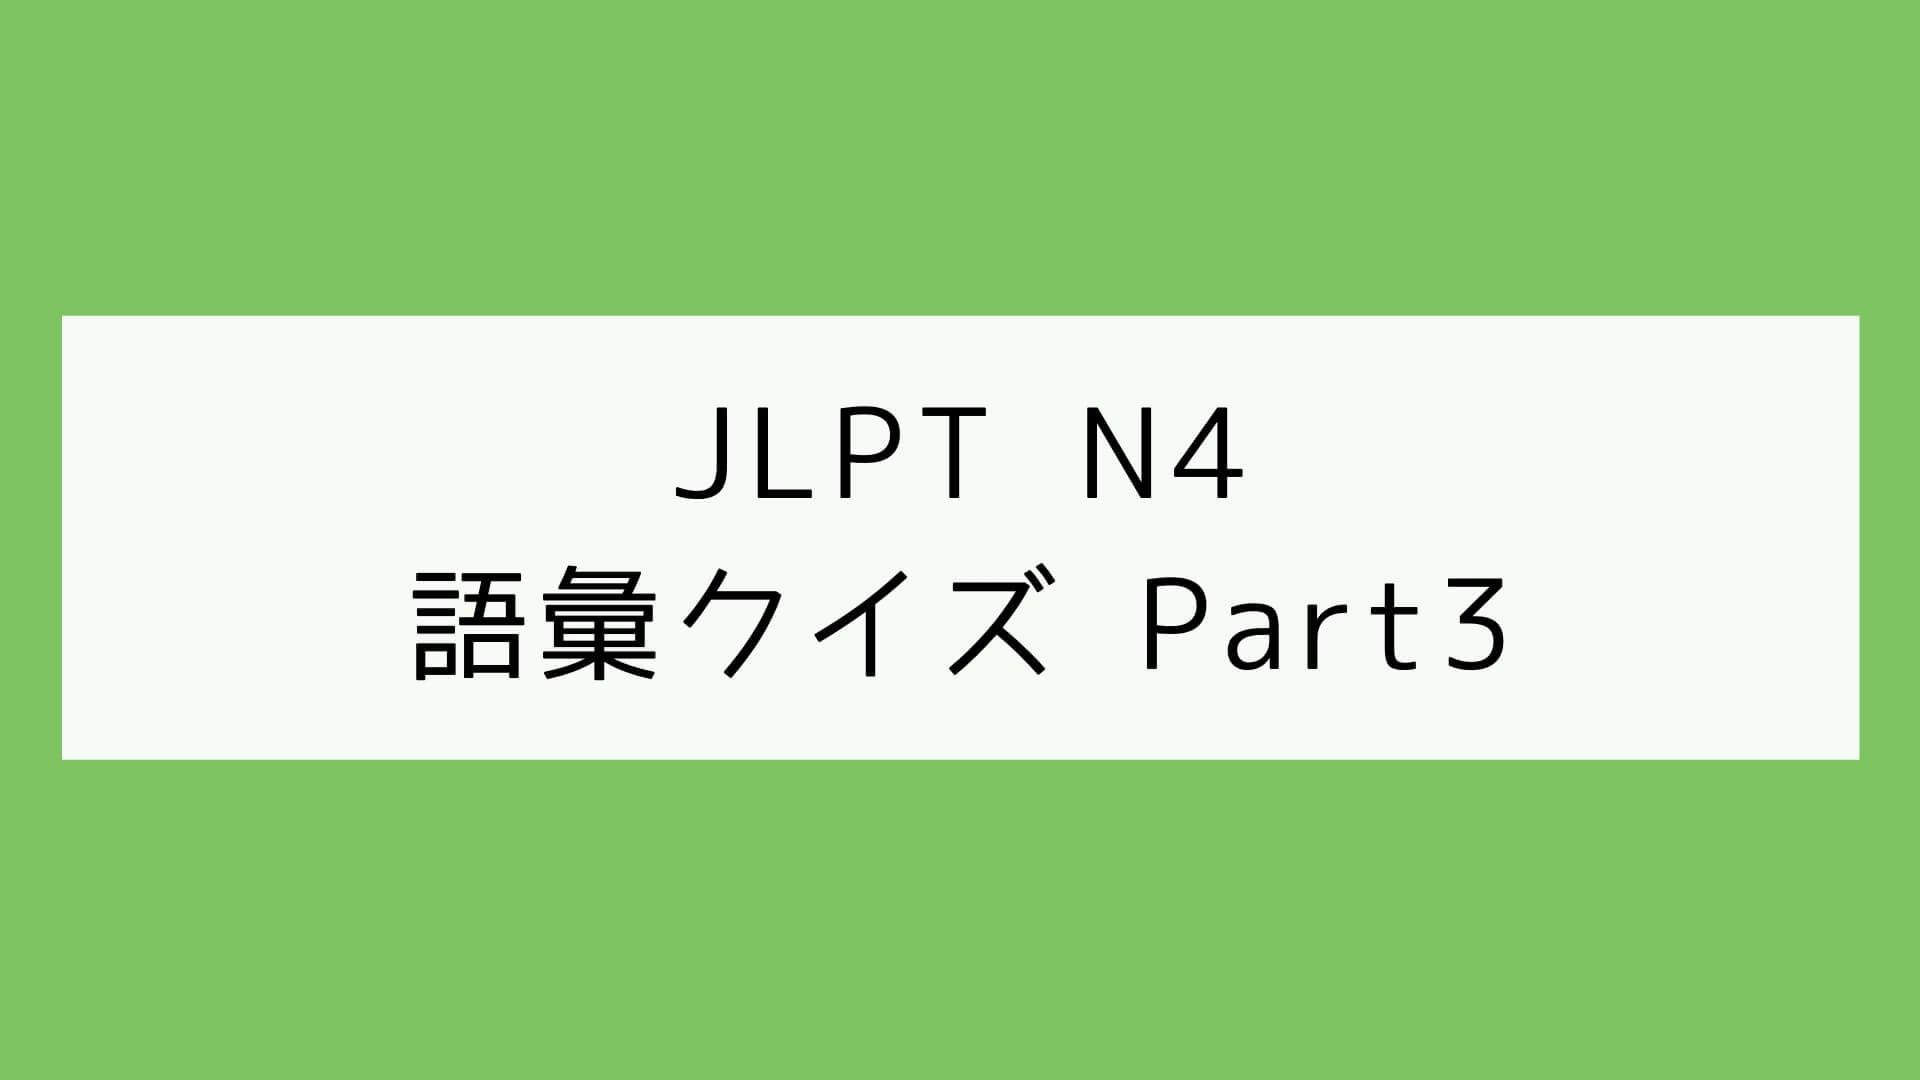 【JLPT N4】語彙クイズ Part3